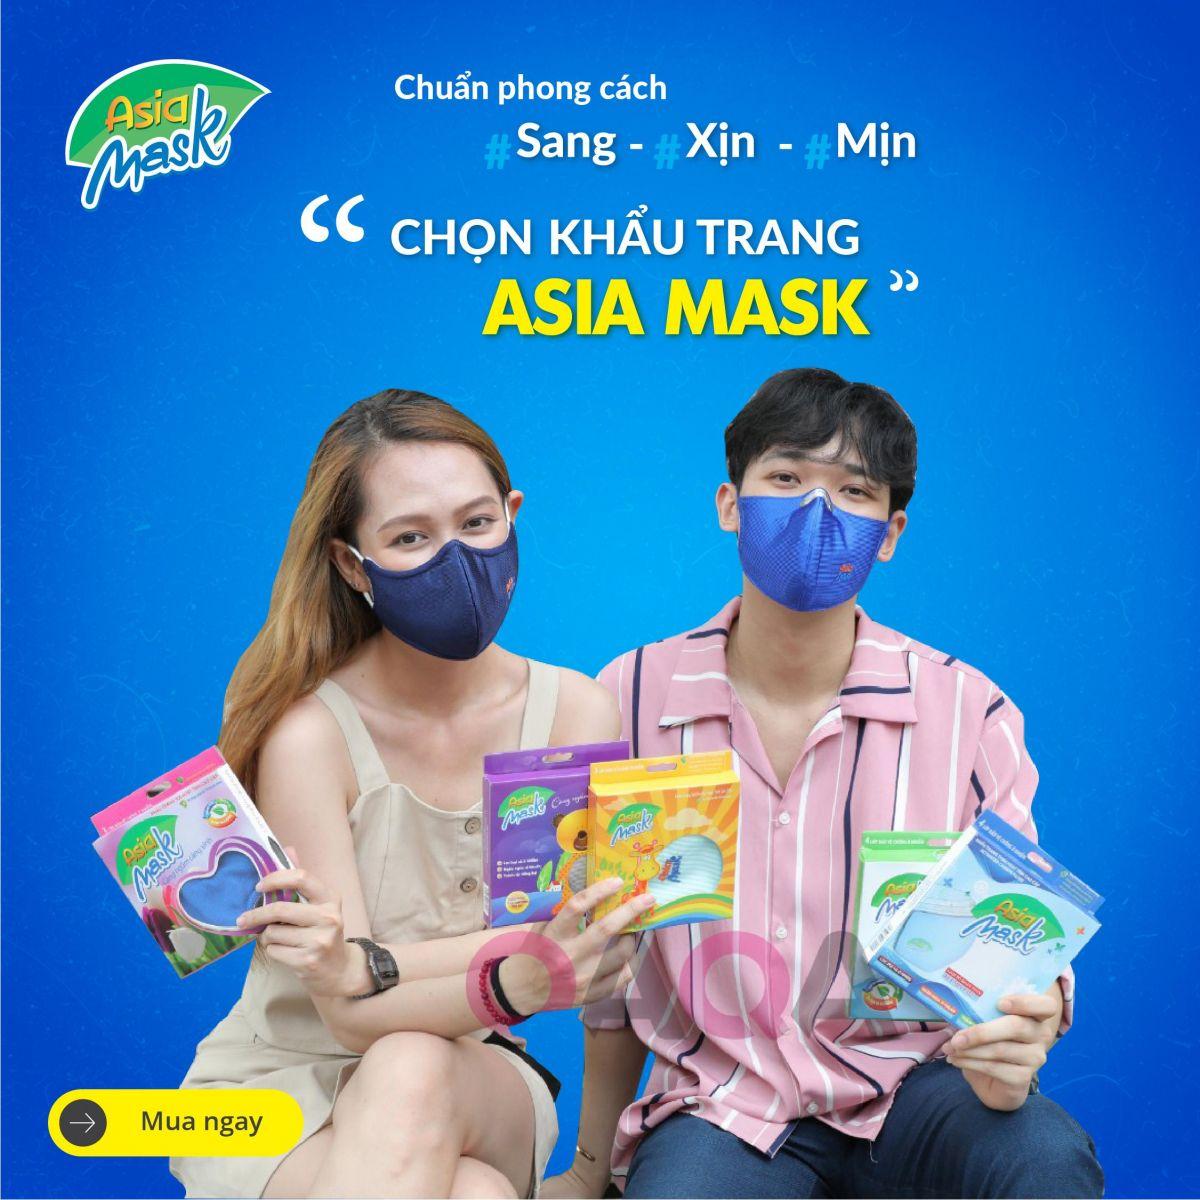 chuan phong cach sang xin min chon khau trang asia mask